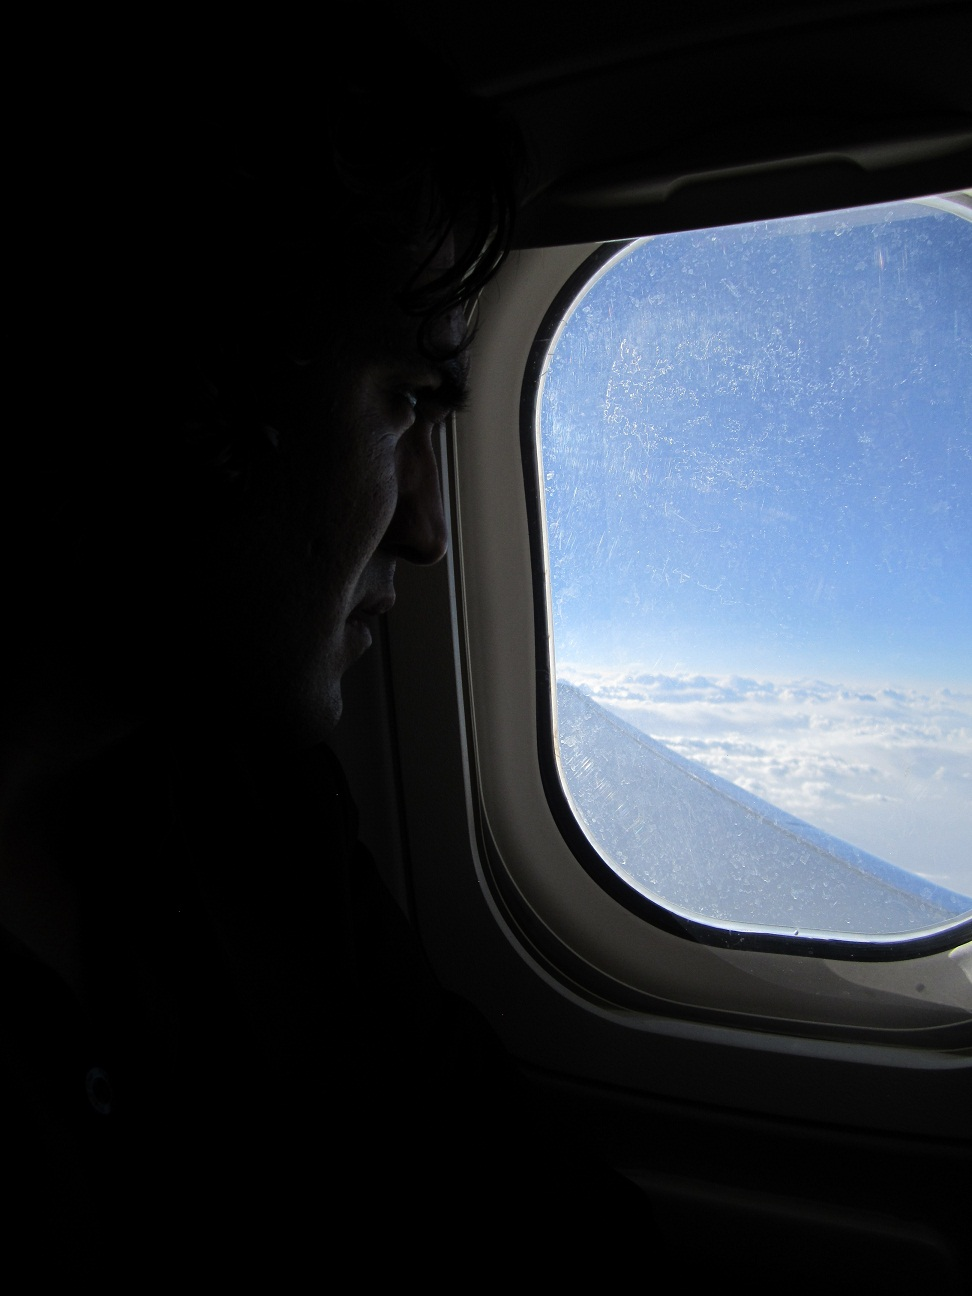 Image by AHMAD MAHMOOD IMPERATOR on plane to Afghanistan